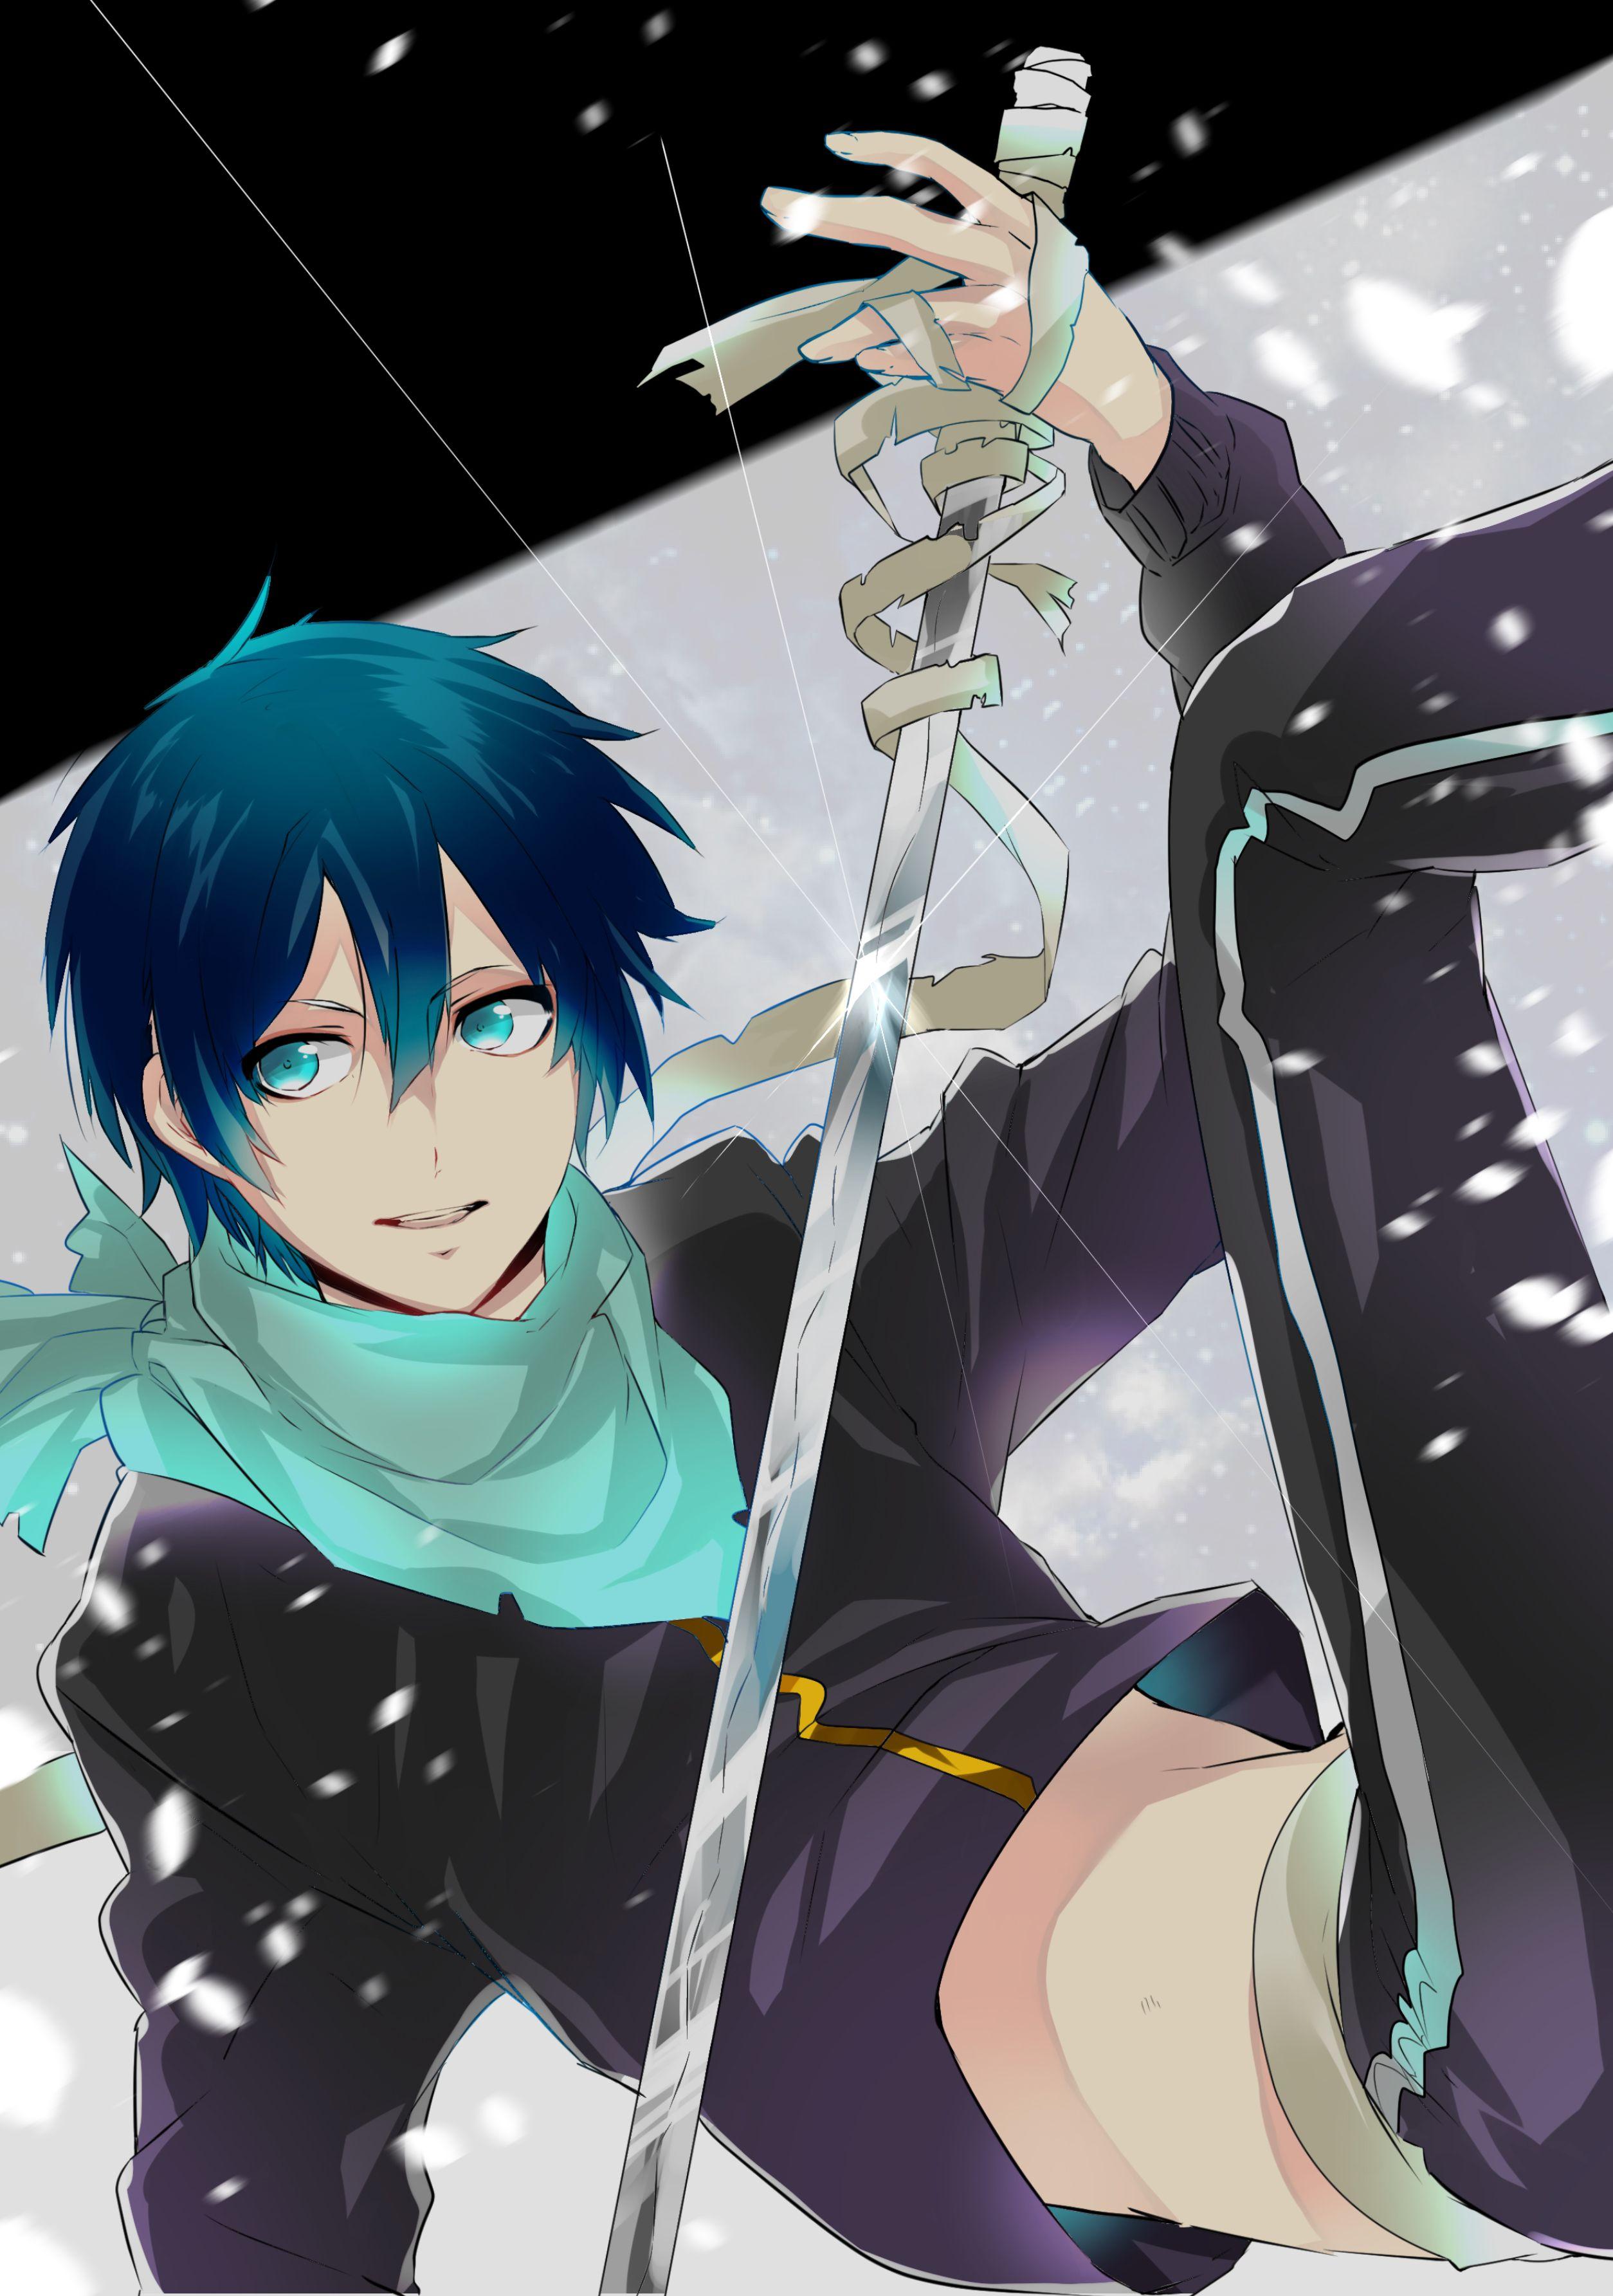 Yato (Noragami) Noragami anime, Noragami, Yato noragami